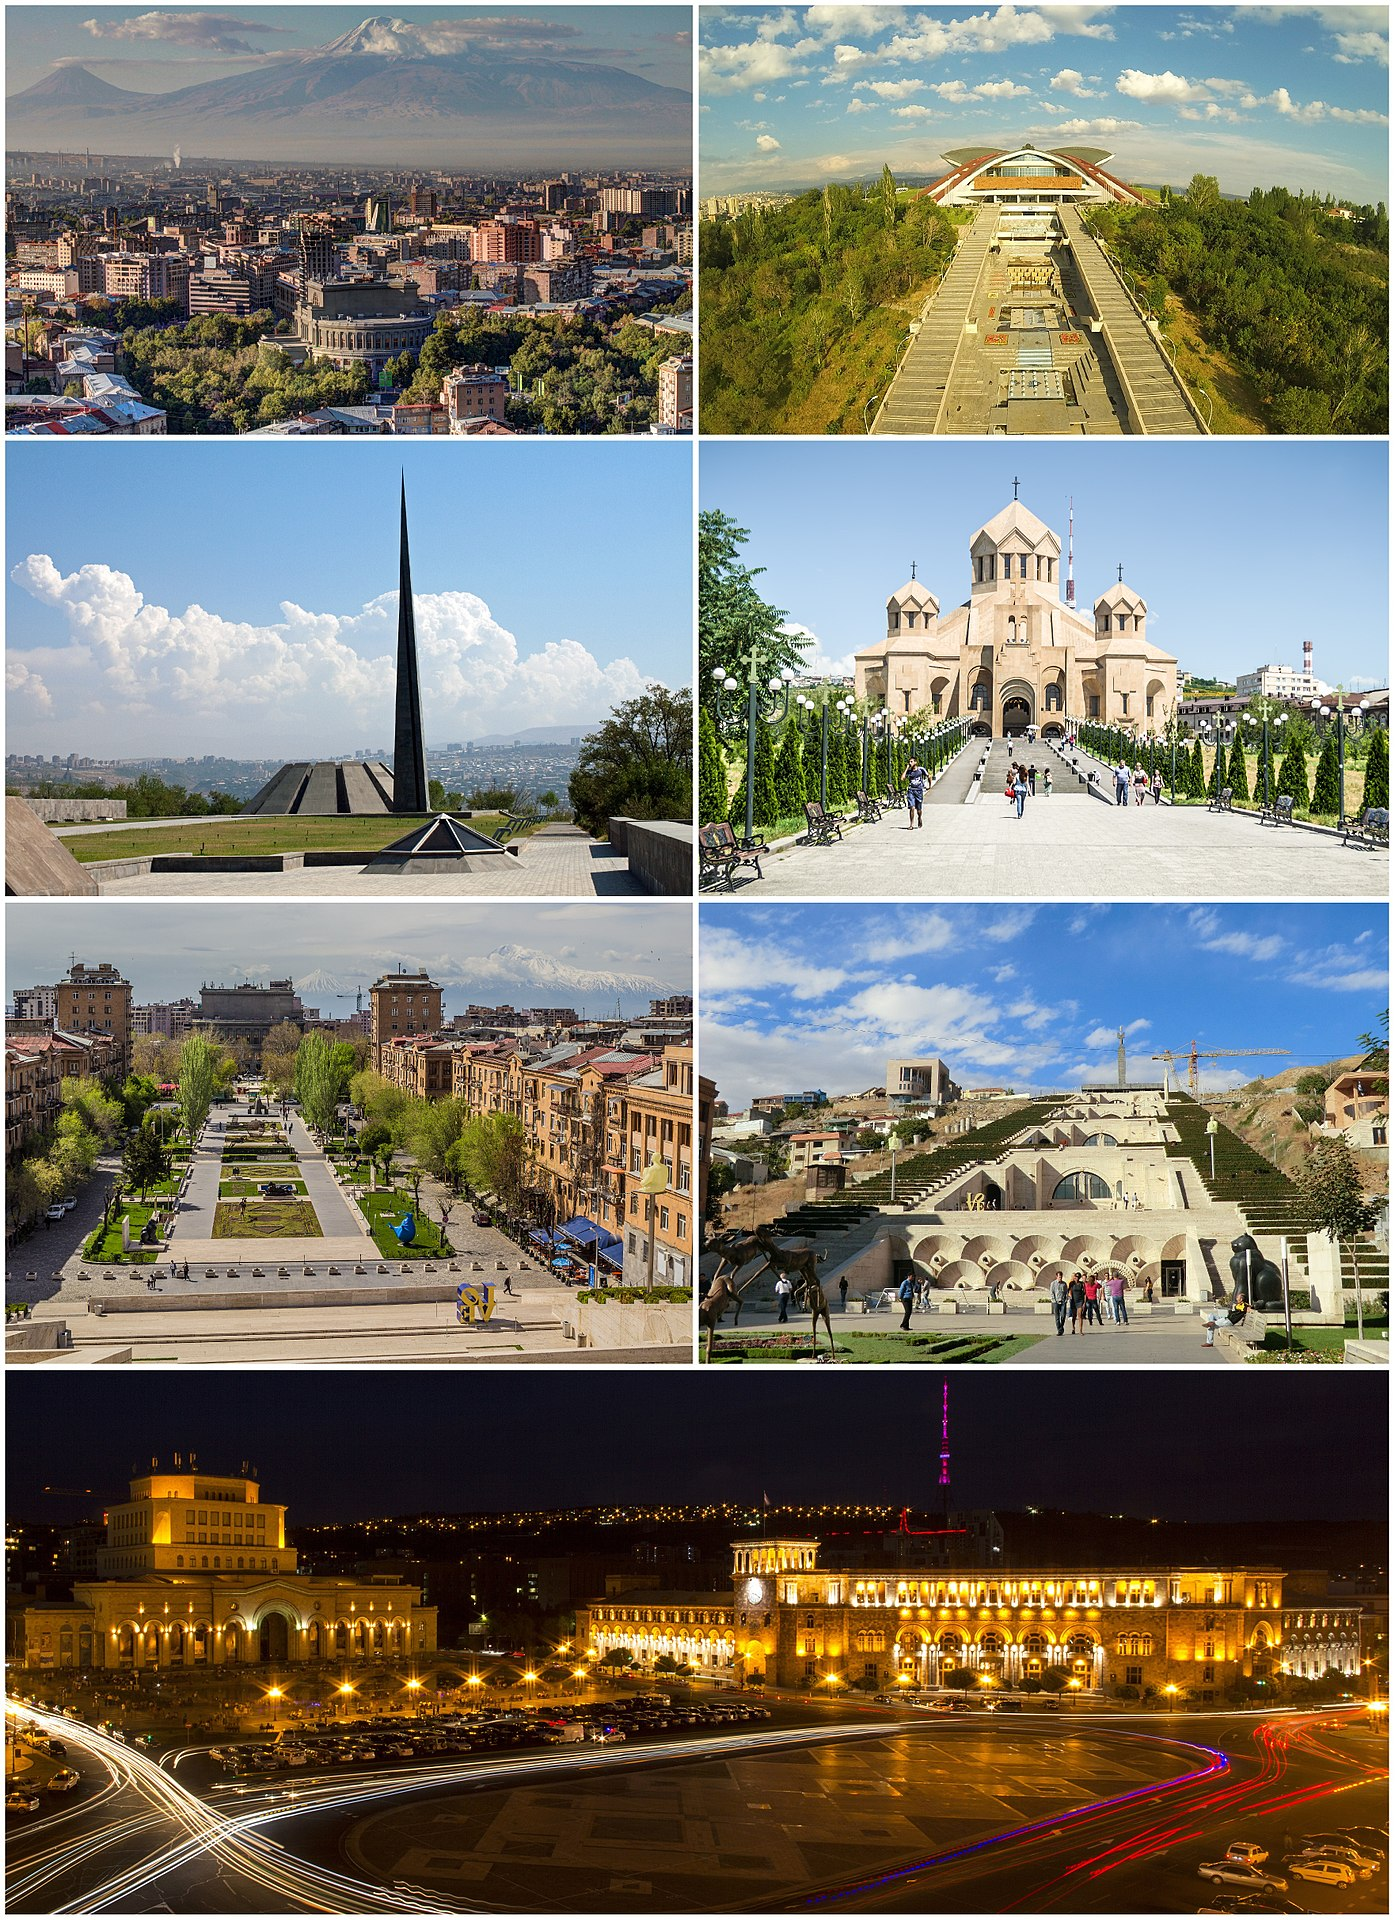 1395px-Yerevan_general_pics_2013.jpg